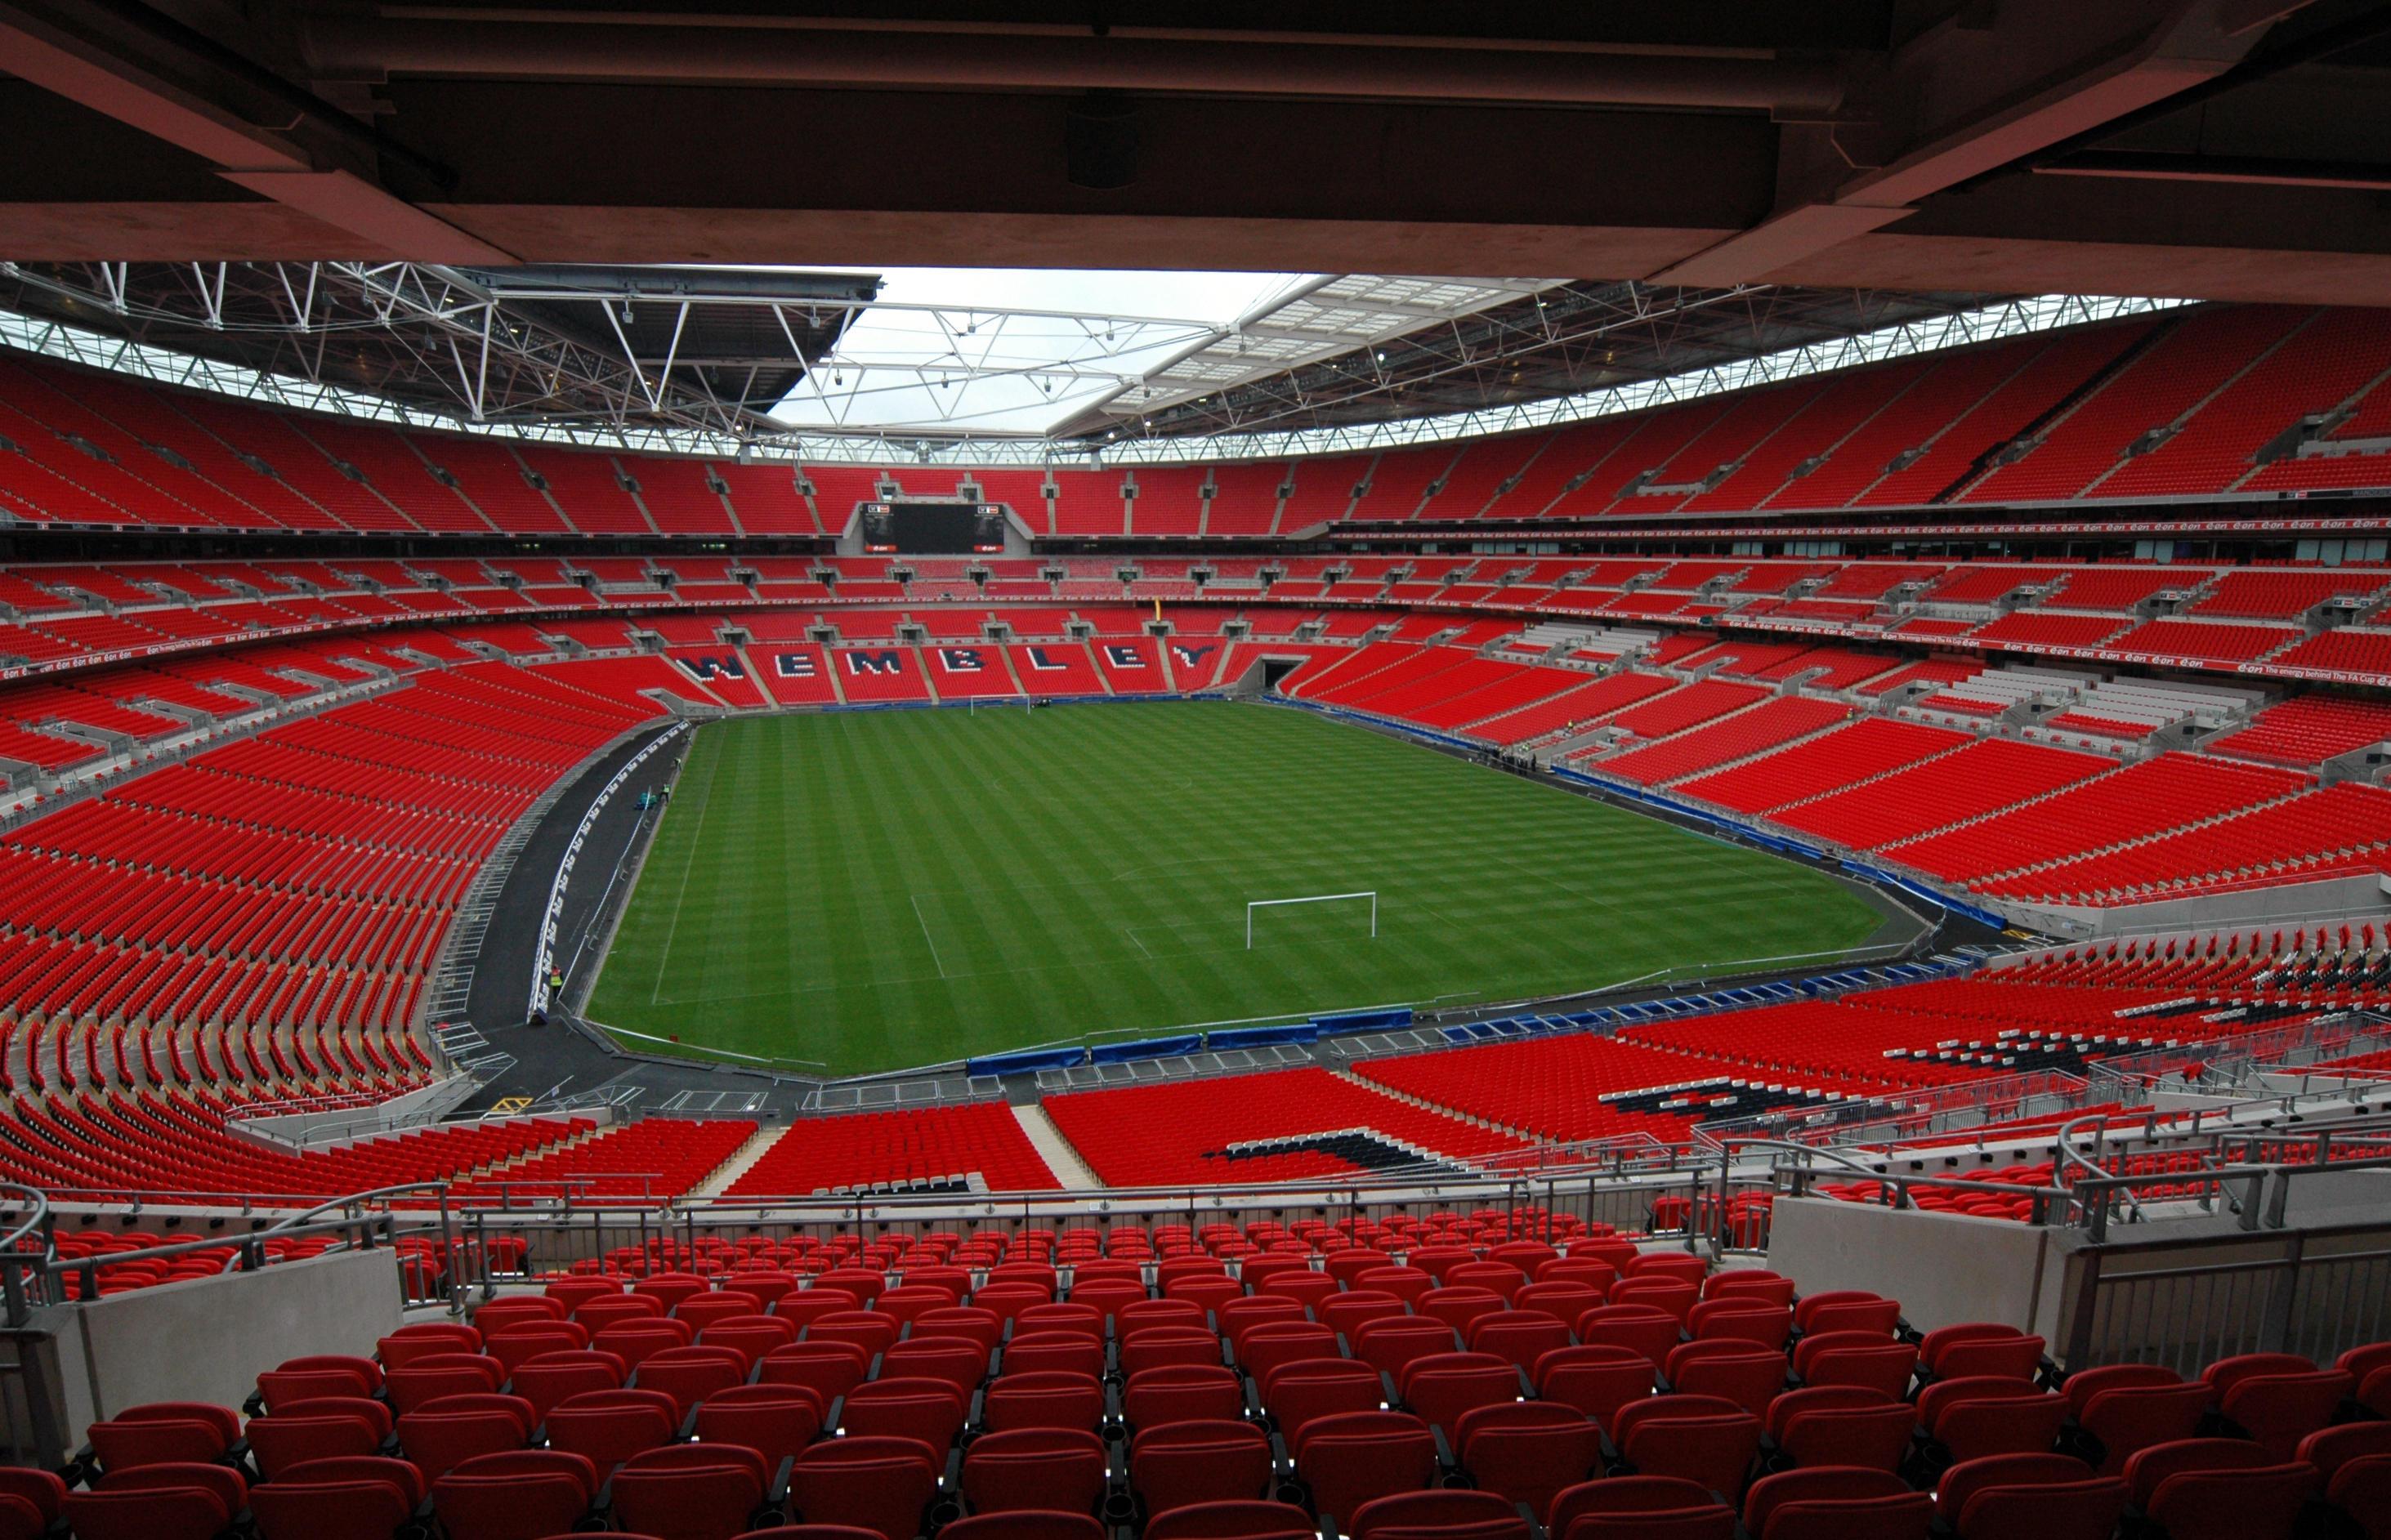 Londra (Inghilterra): Wembley Stadium